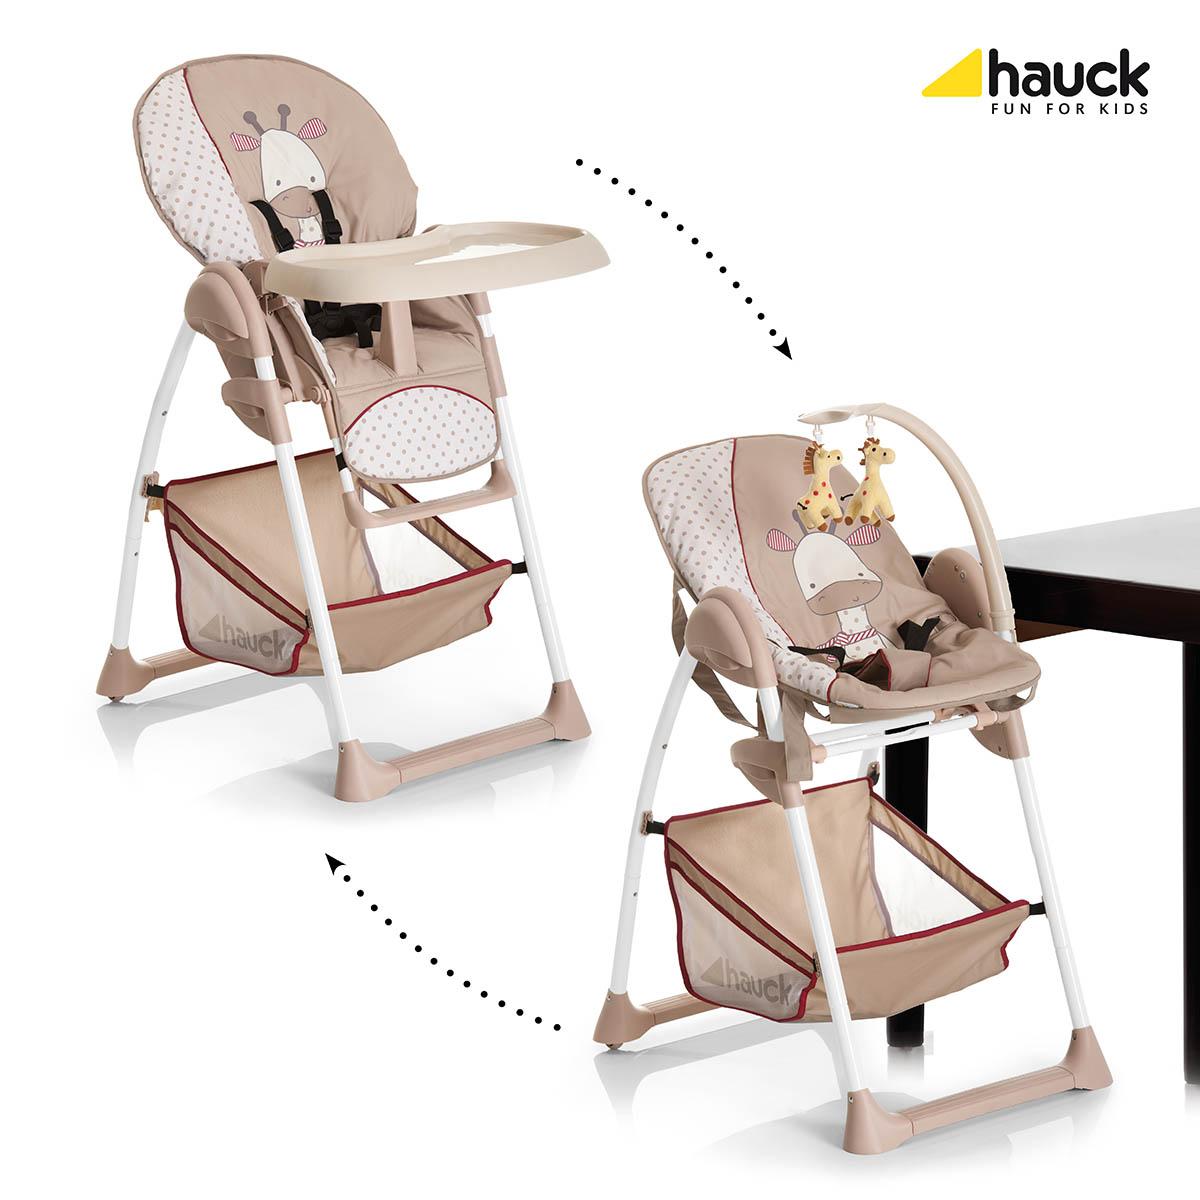 Hauck Sit´n Relax 2017 jídelní židlička 2v1 : giraffe